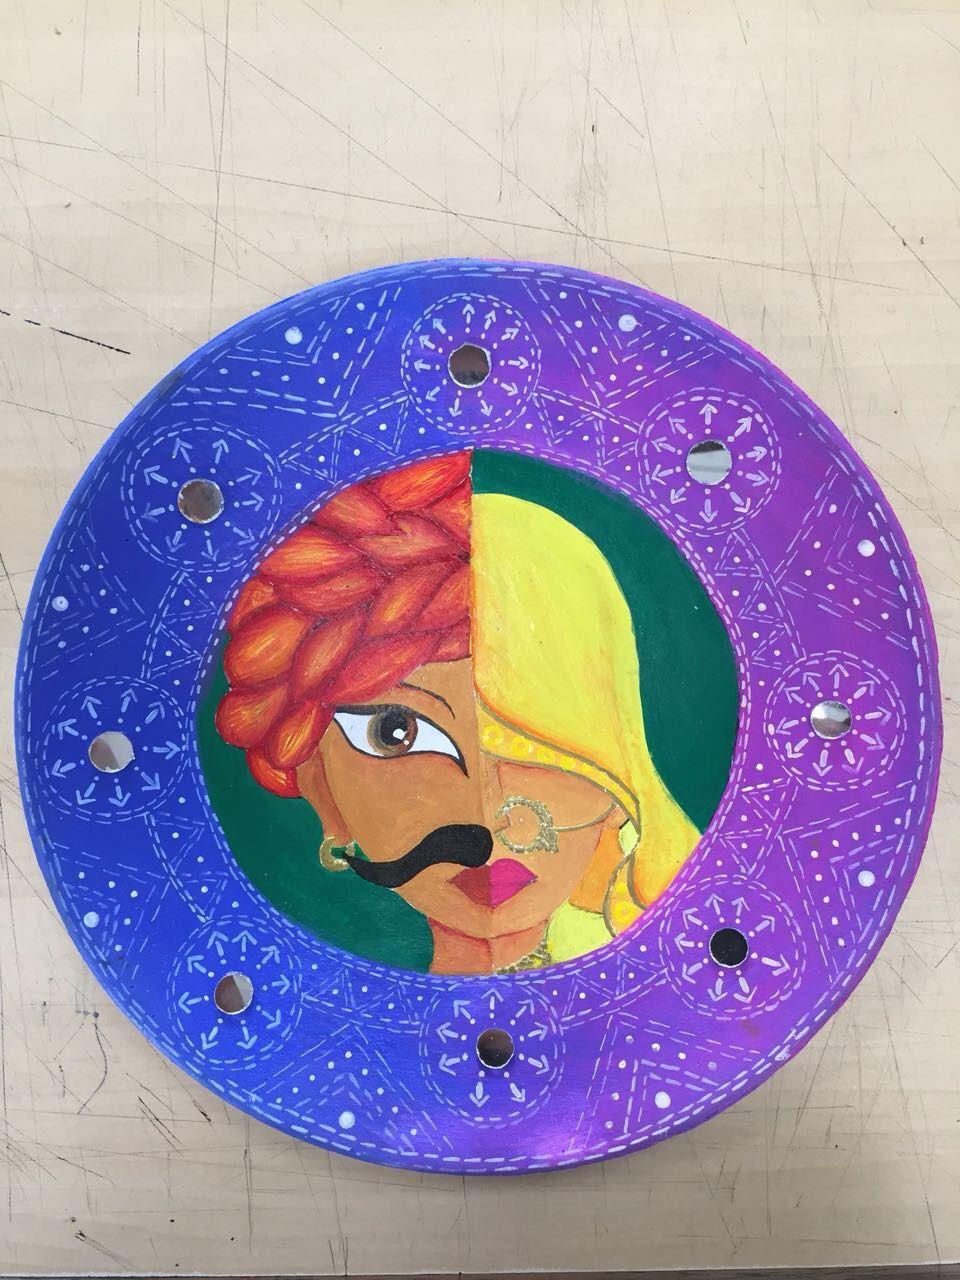 Painting On Earthen Plate Tawa Art Earthenware Acrylic Acrylicpainting Mirrorwork Indian Indi Disney Art Diy Mixed Media Art Canvas Folk Art Painting